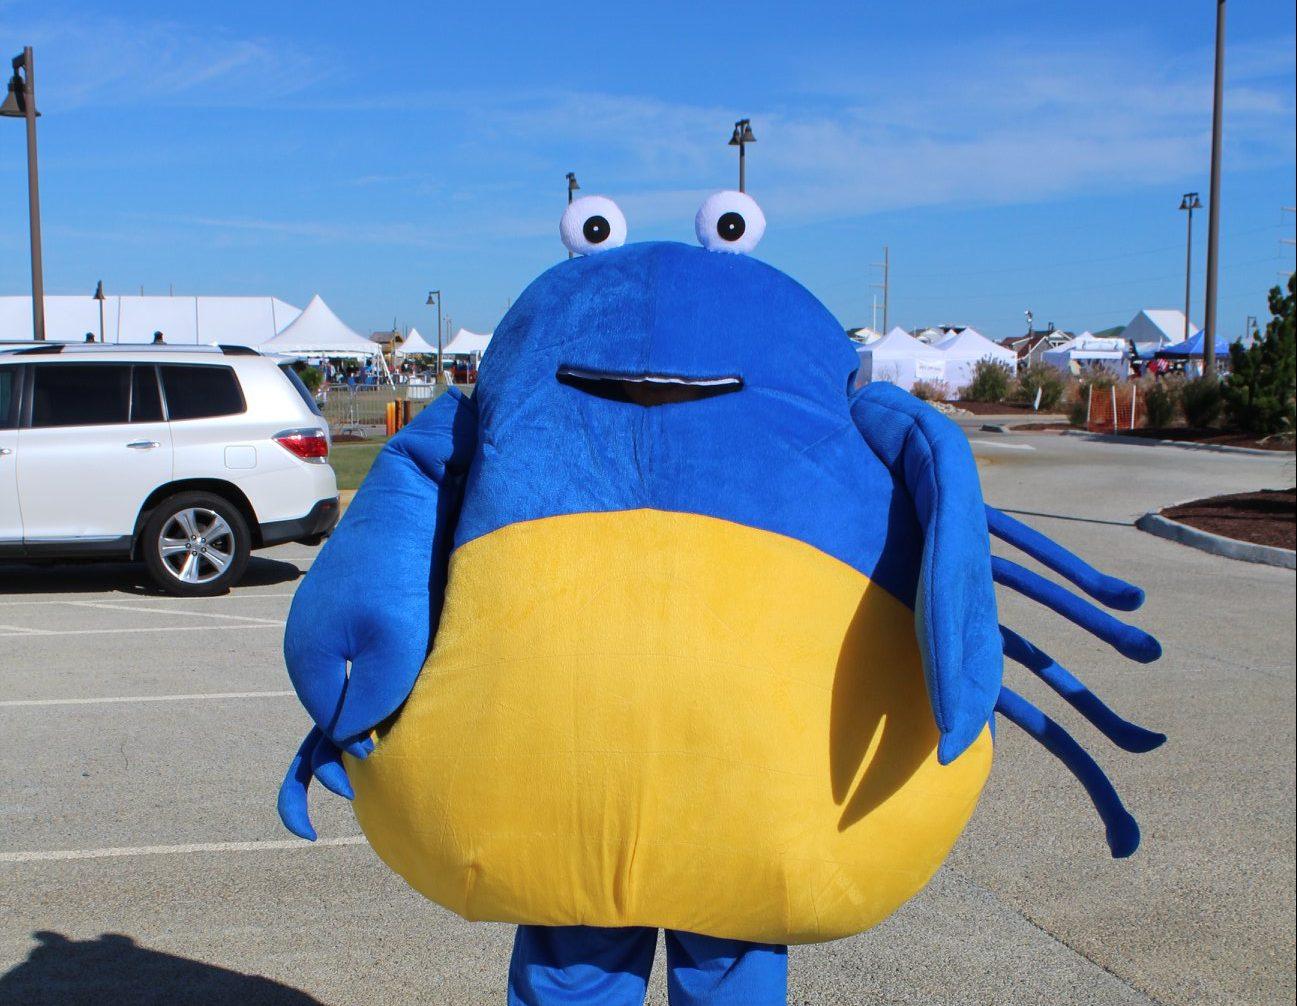 Outer Banks Seafood Festival returns in October - OBXToday.com